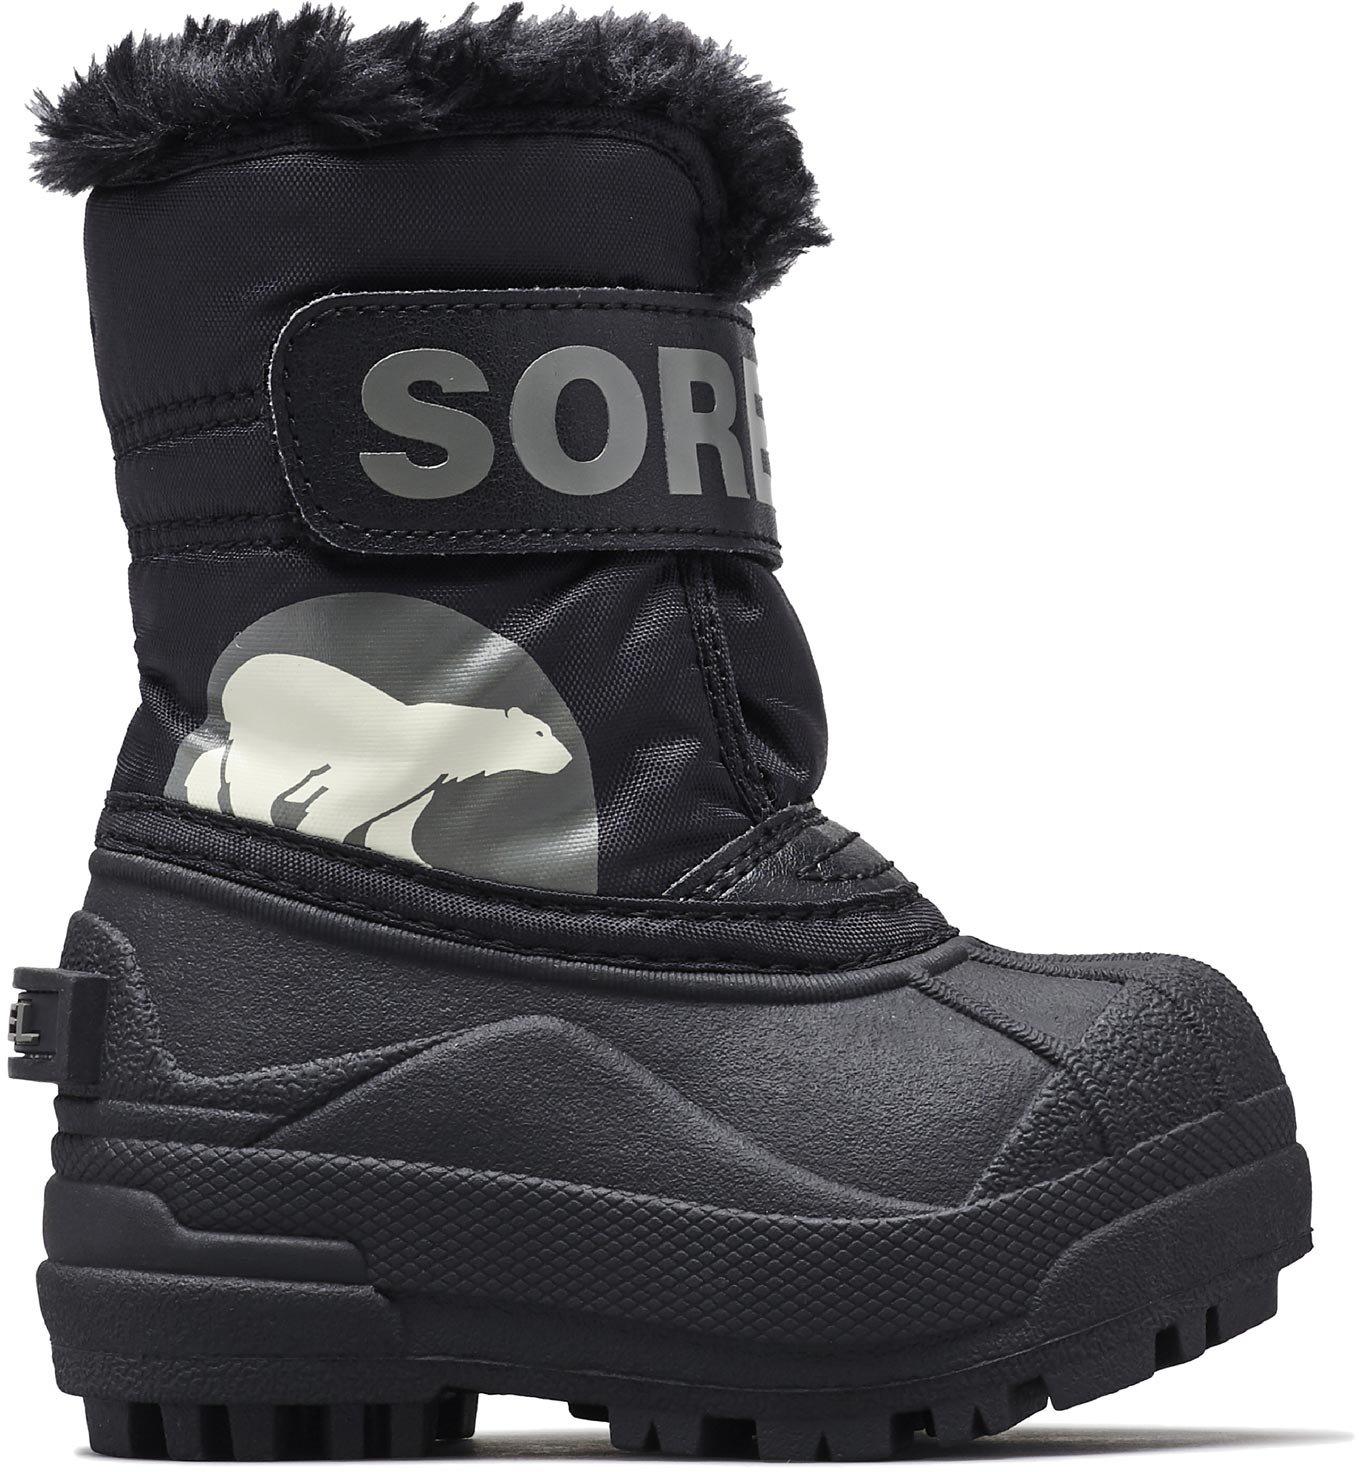 Sorel Toddler Snow Commander 21 Sorel Chlapecké sněhule ... 01ae867765